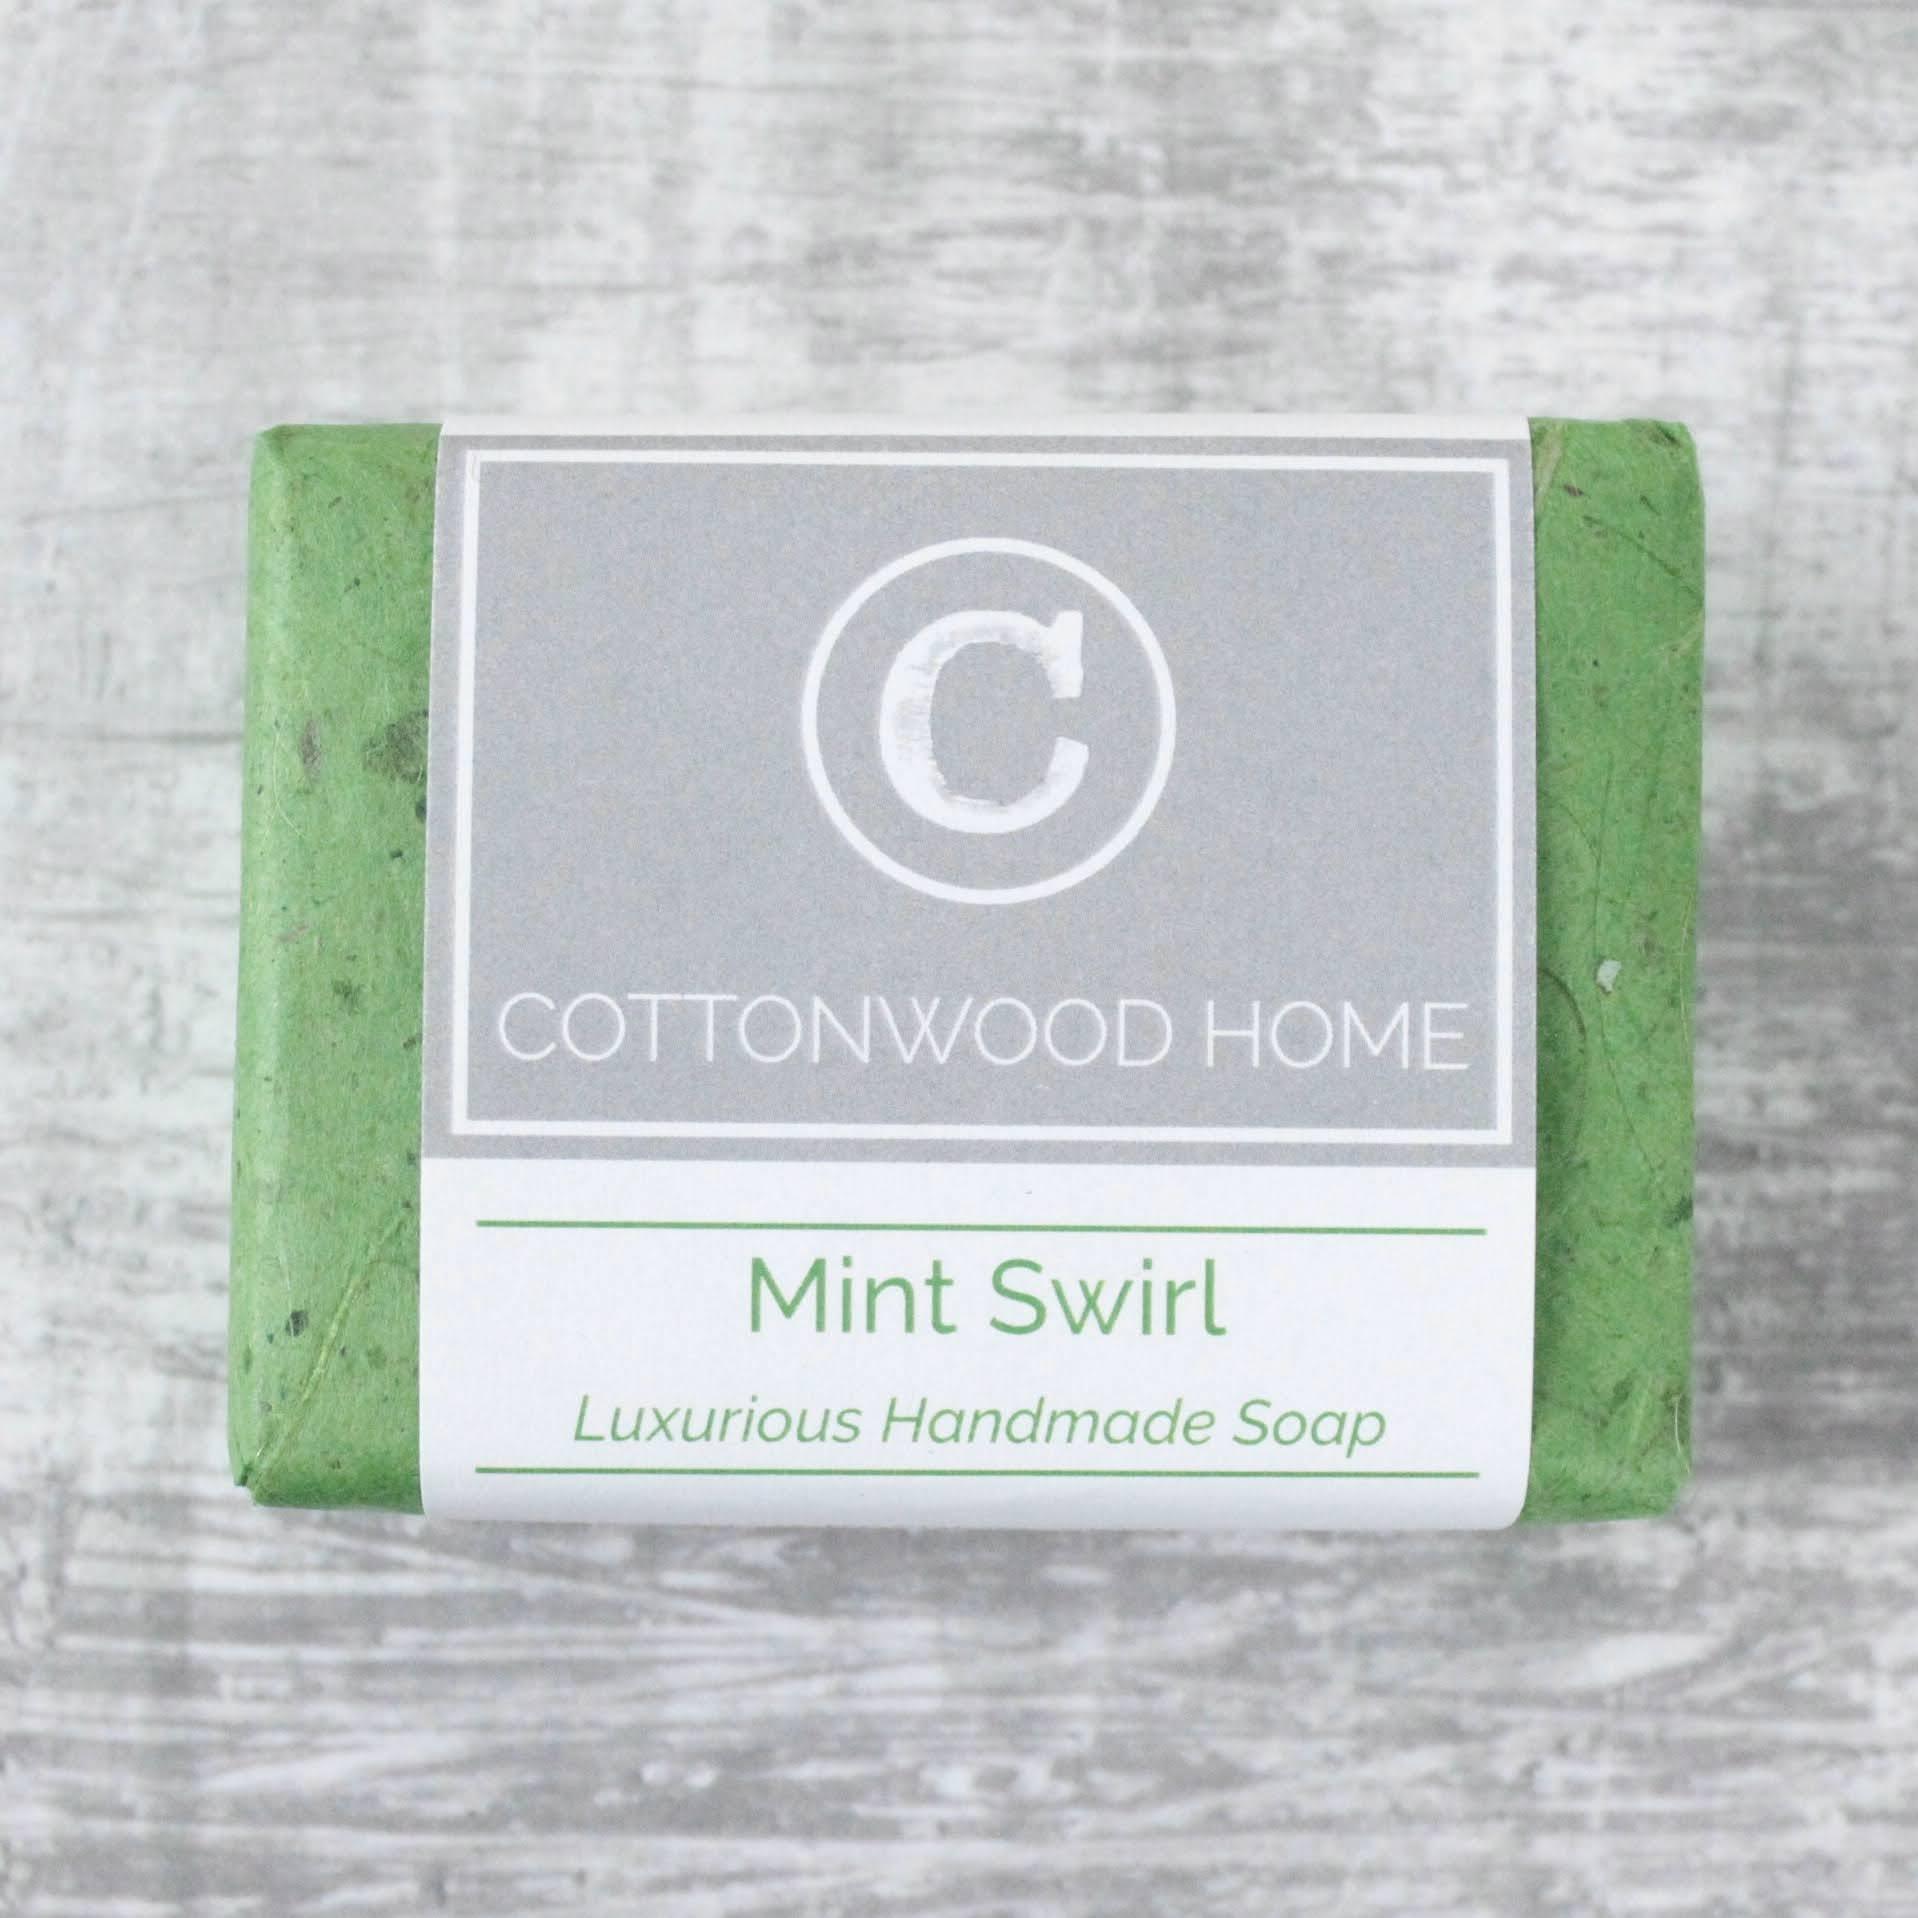 Cottonwood Soap - Mint Swirl